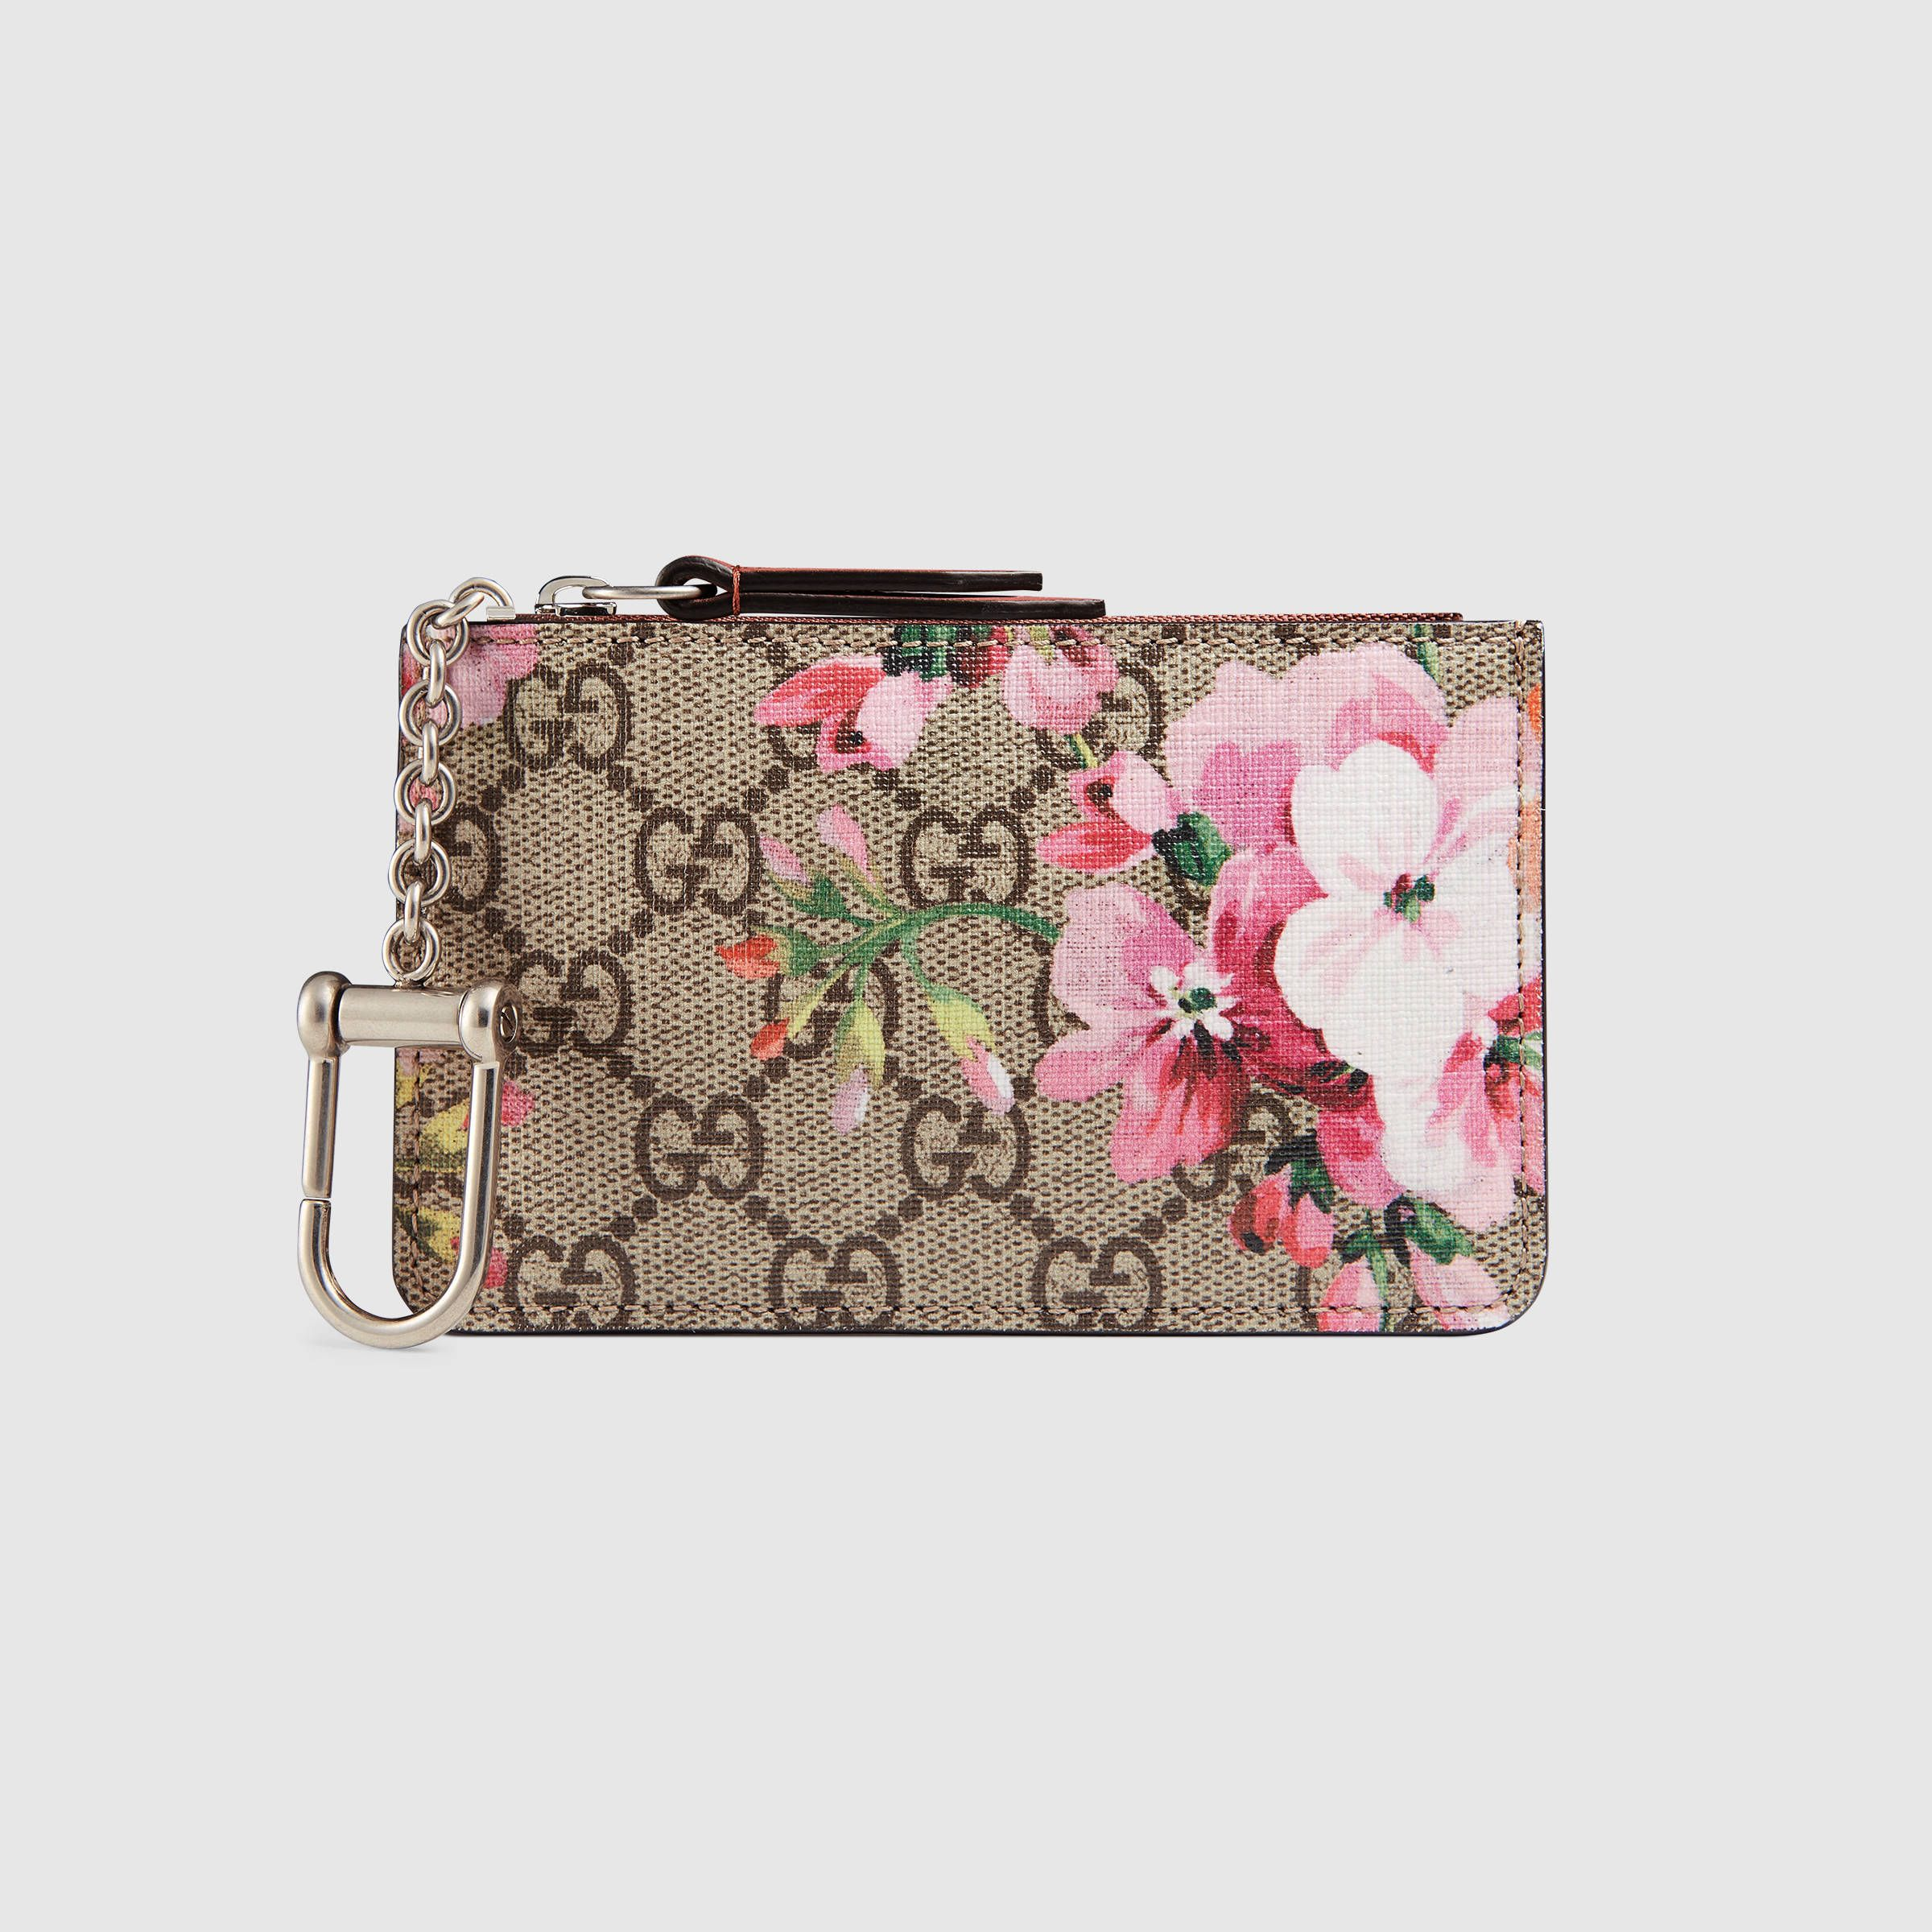 Gucci GG Blooms key case